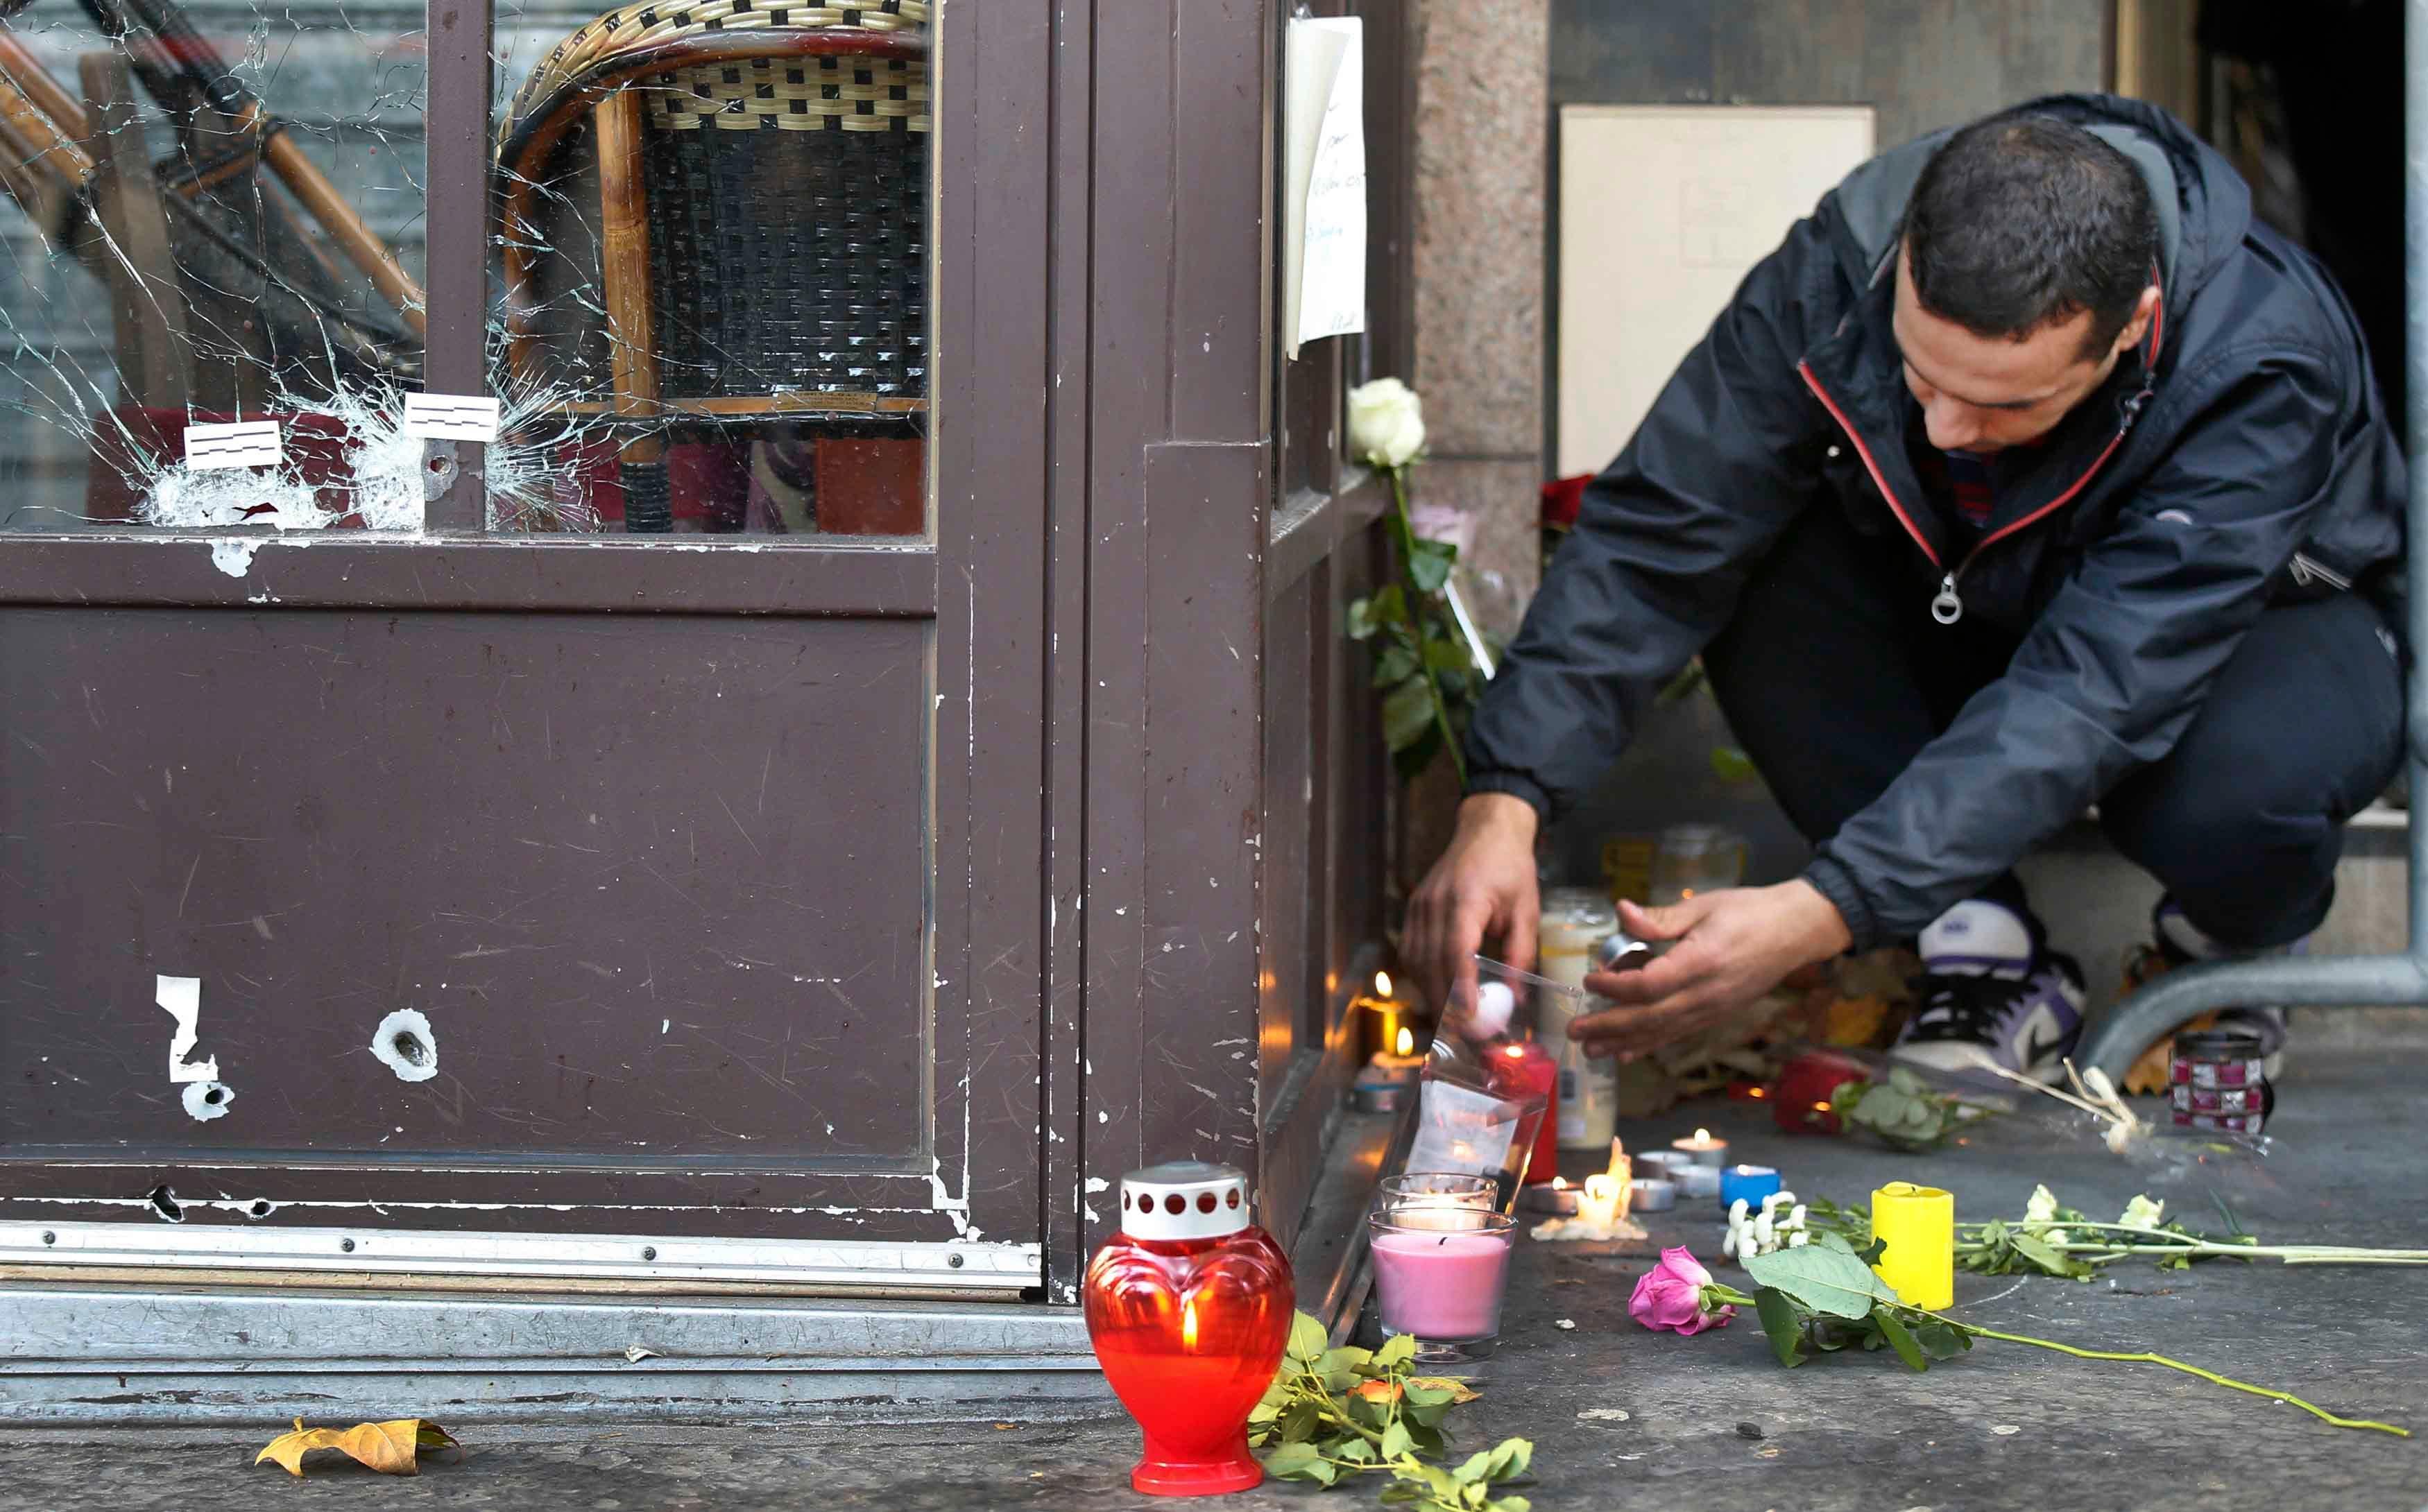 Paris attack aftermath